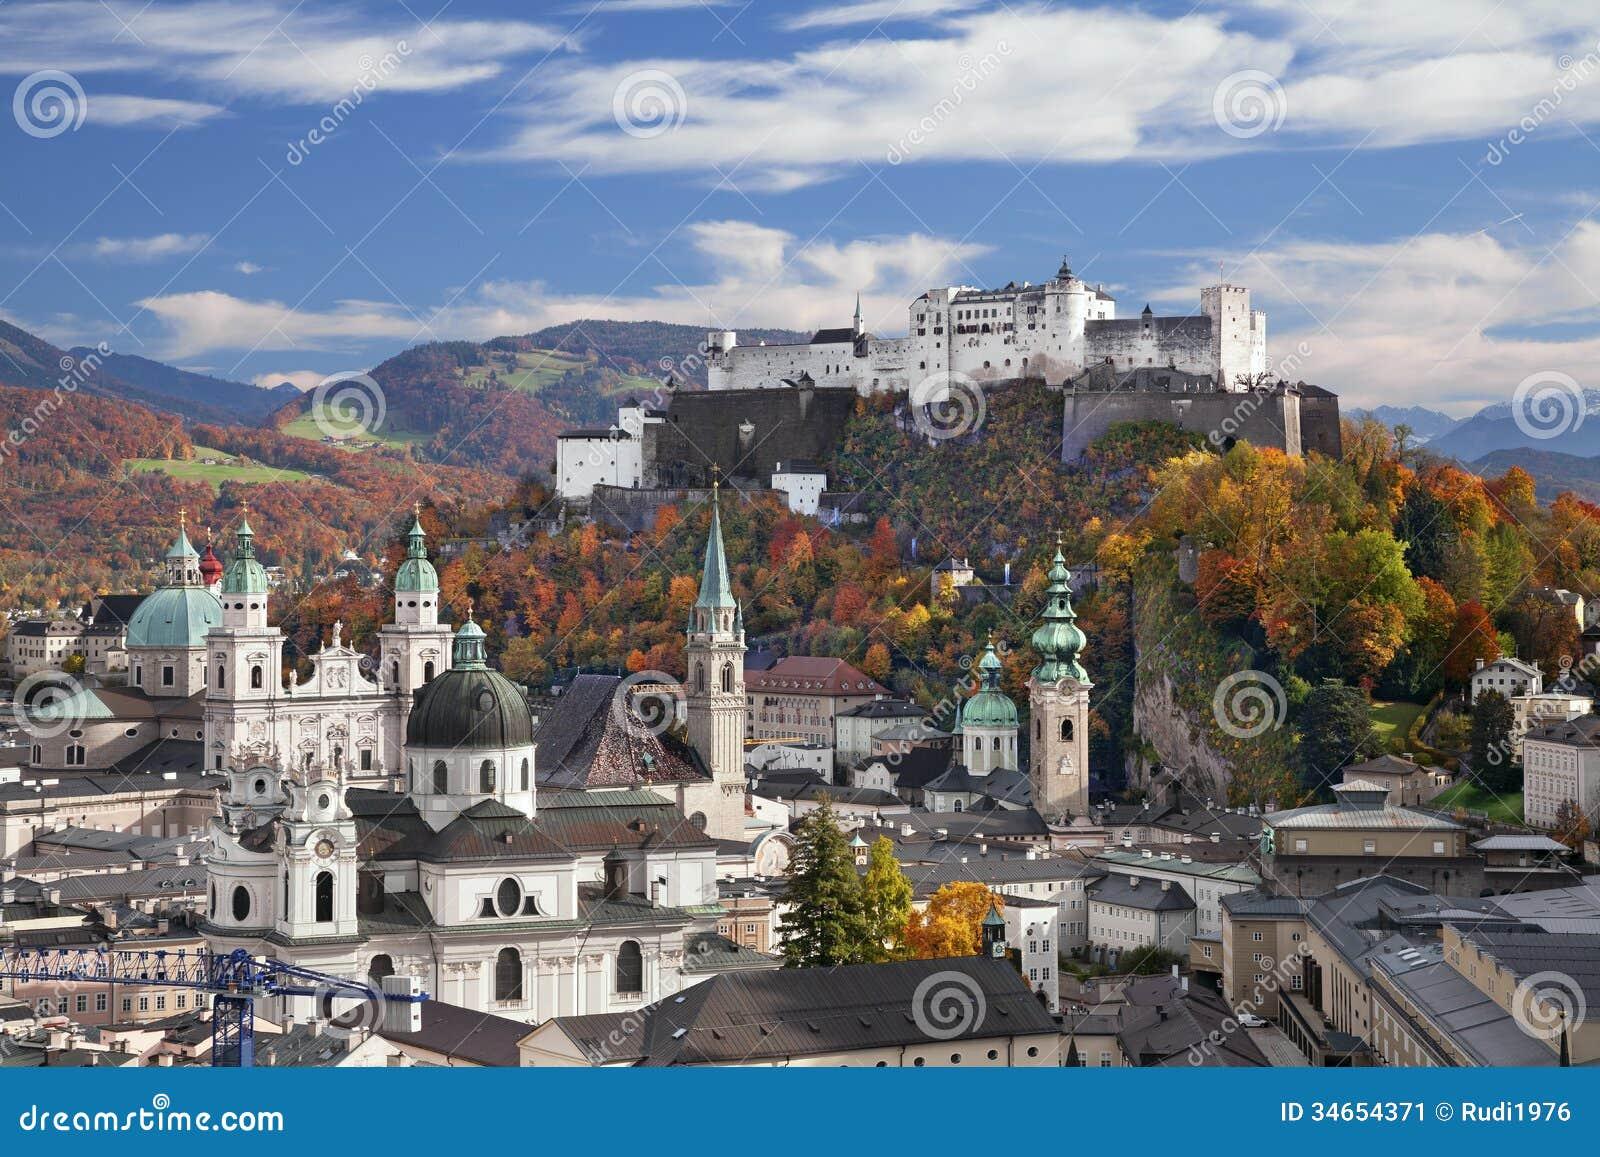 Download Salzburg, Austria. stock image. Image of color, architecture - 34654371